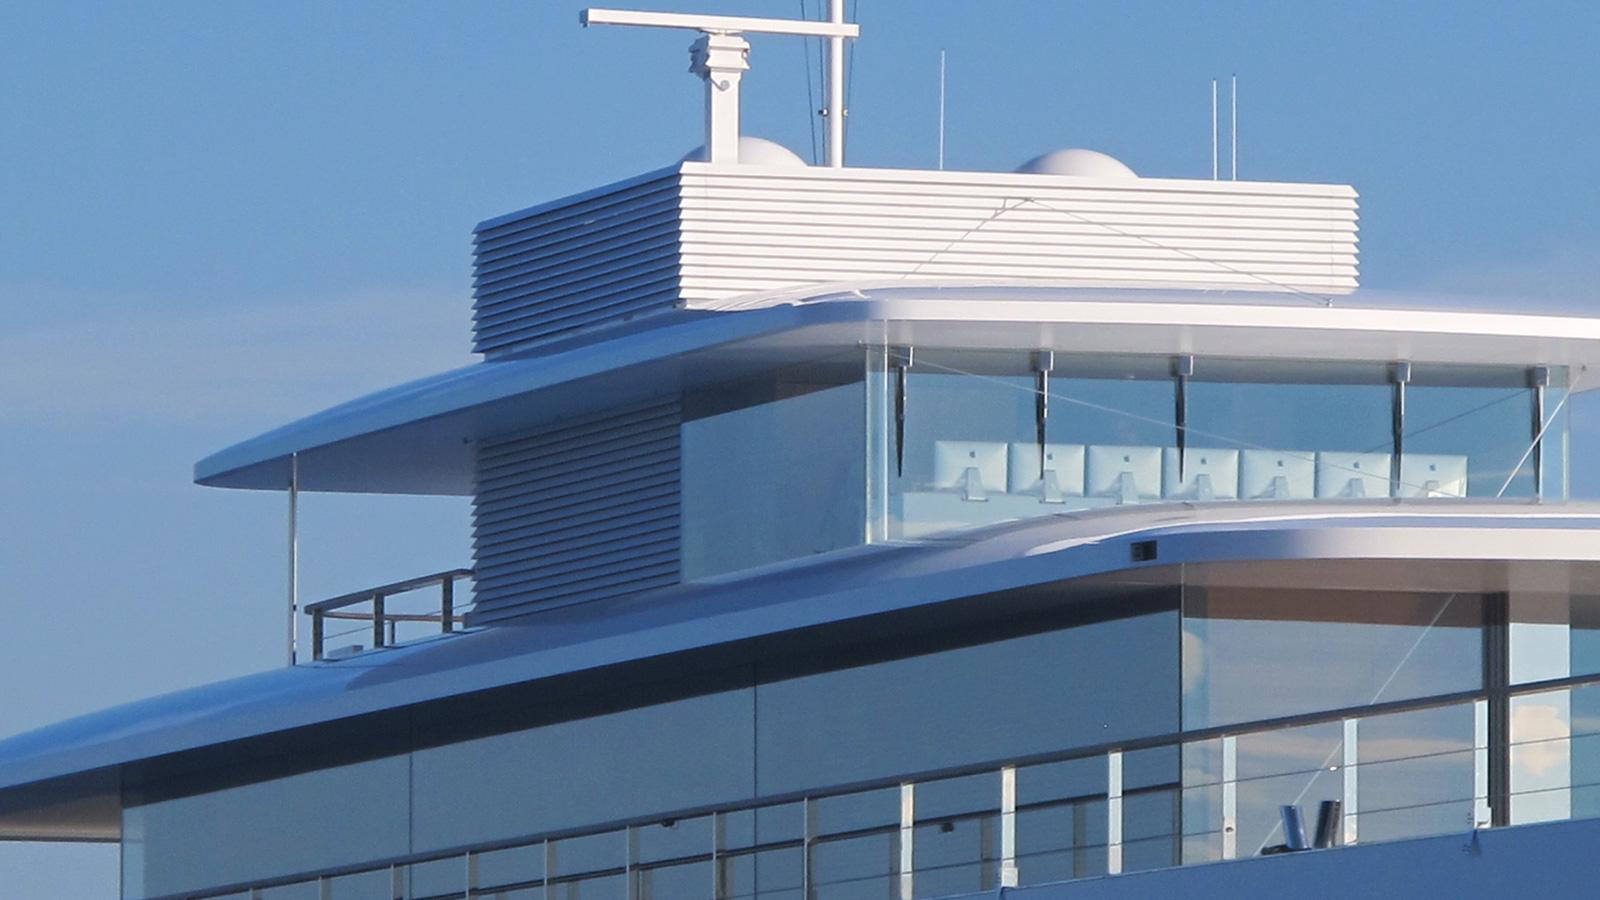 steve jobs Inside Steve Jobs' Luxury Yacht onsmBsLR76RbY6fb0bLi venus yacht bridge mac computers